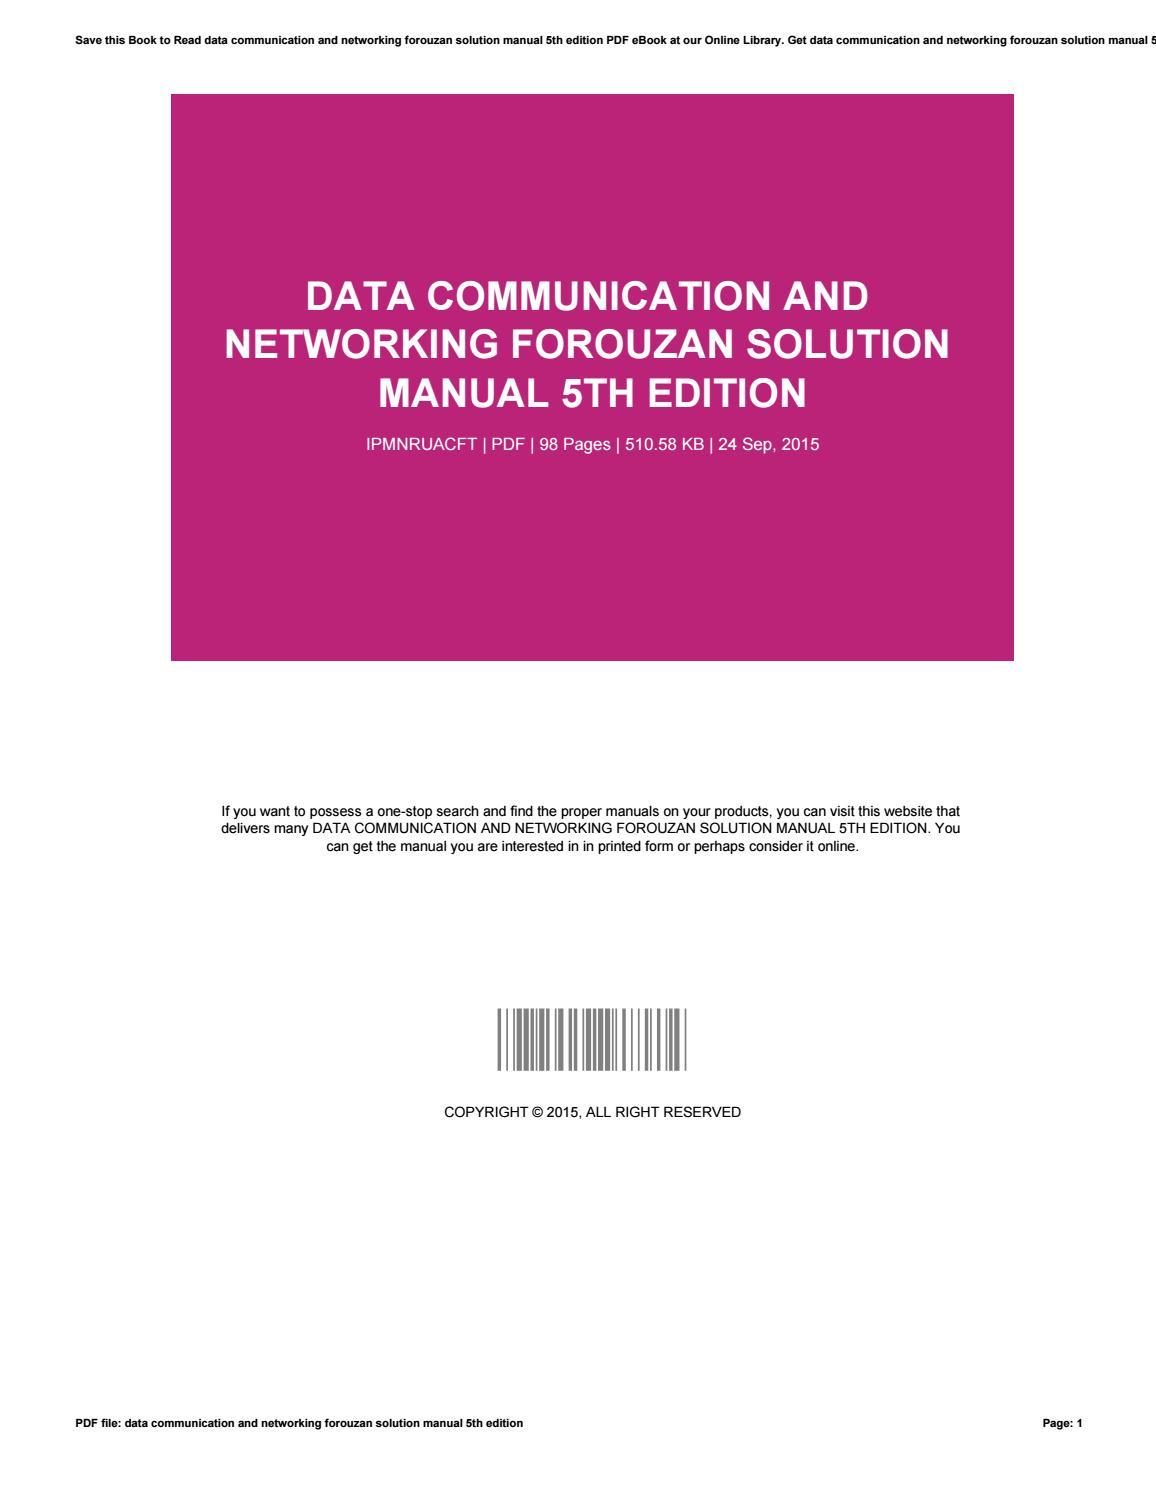 data communication book pdf free download